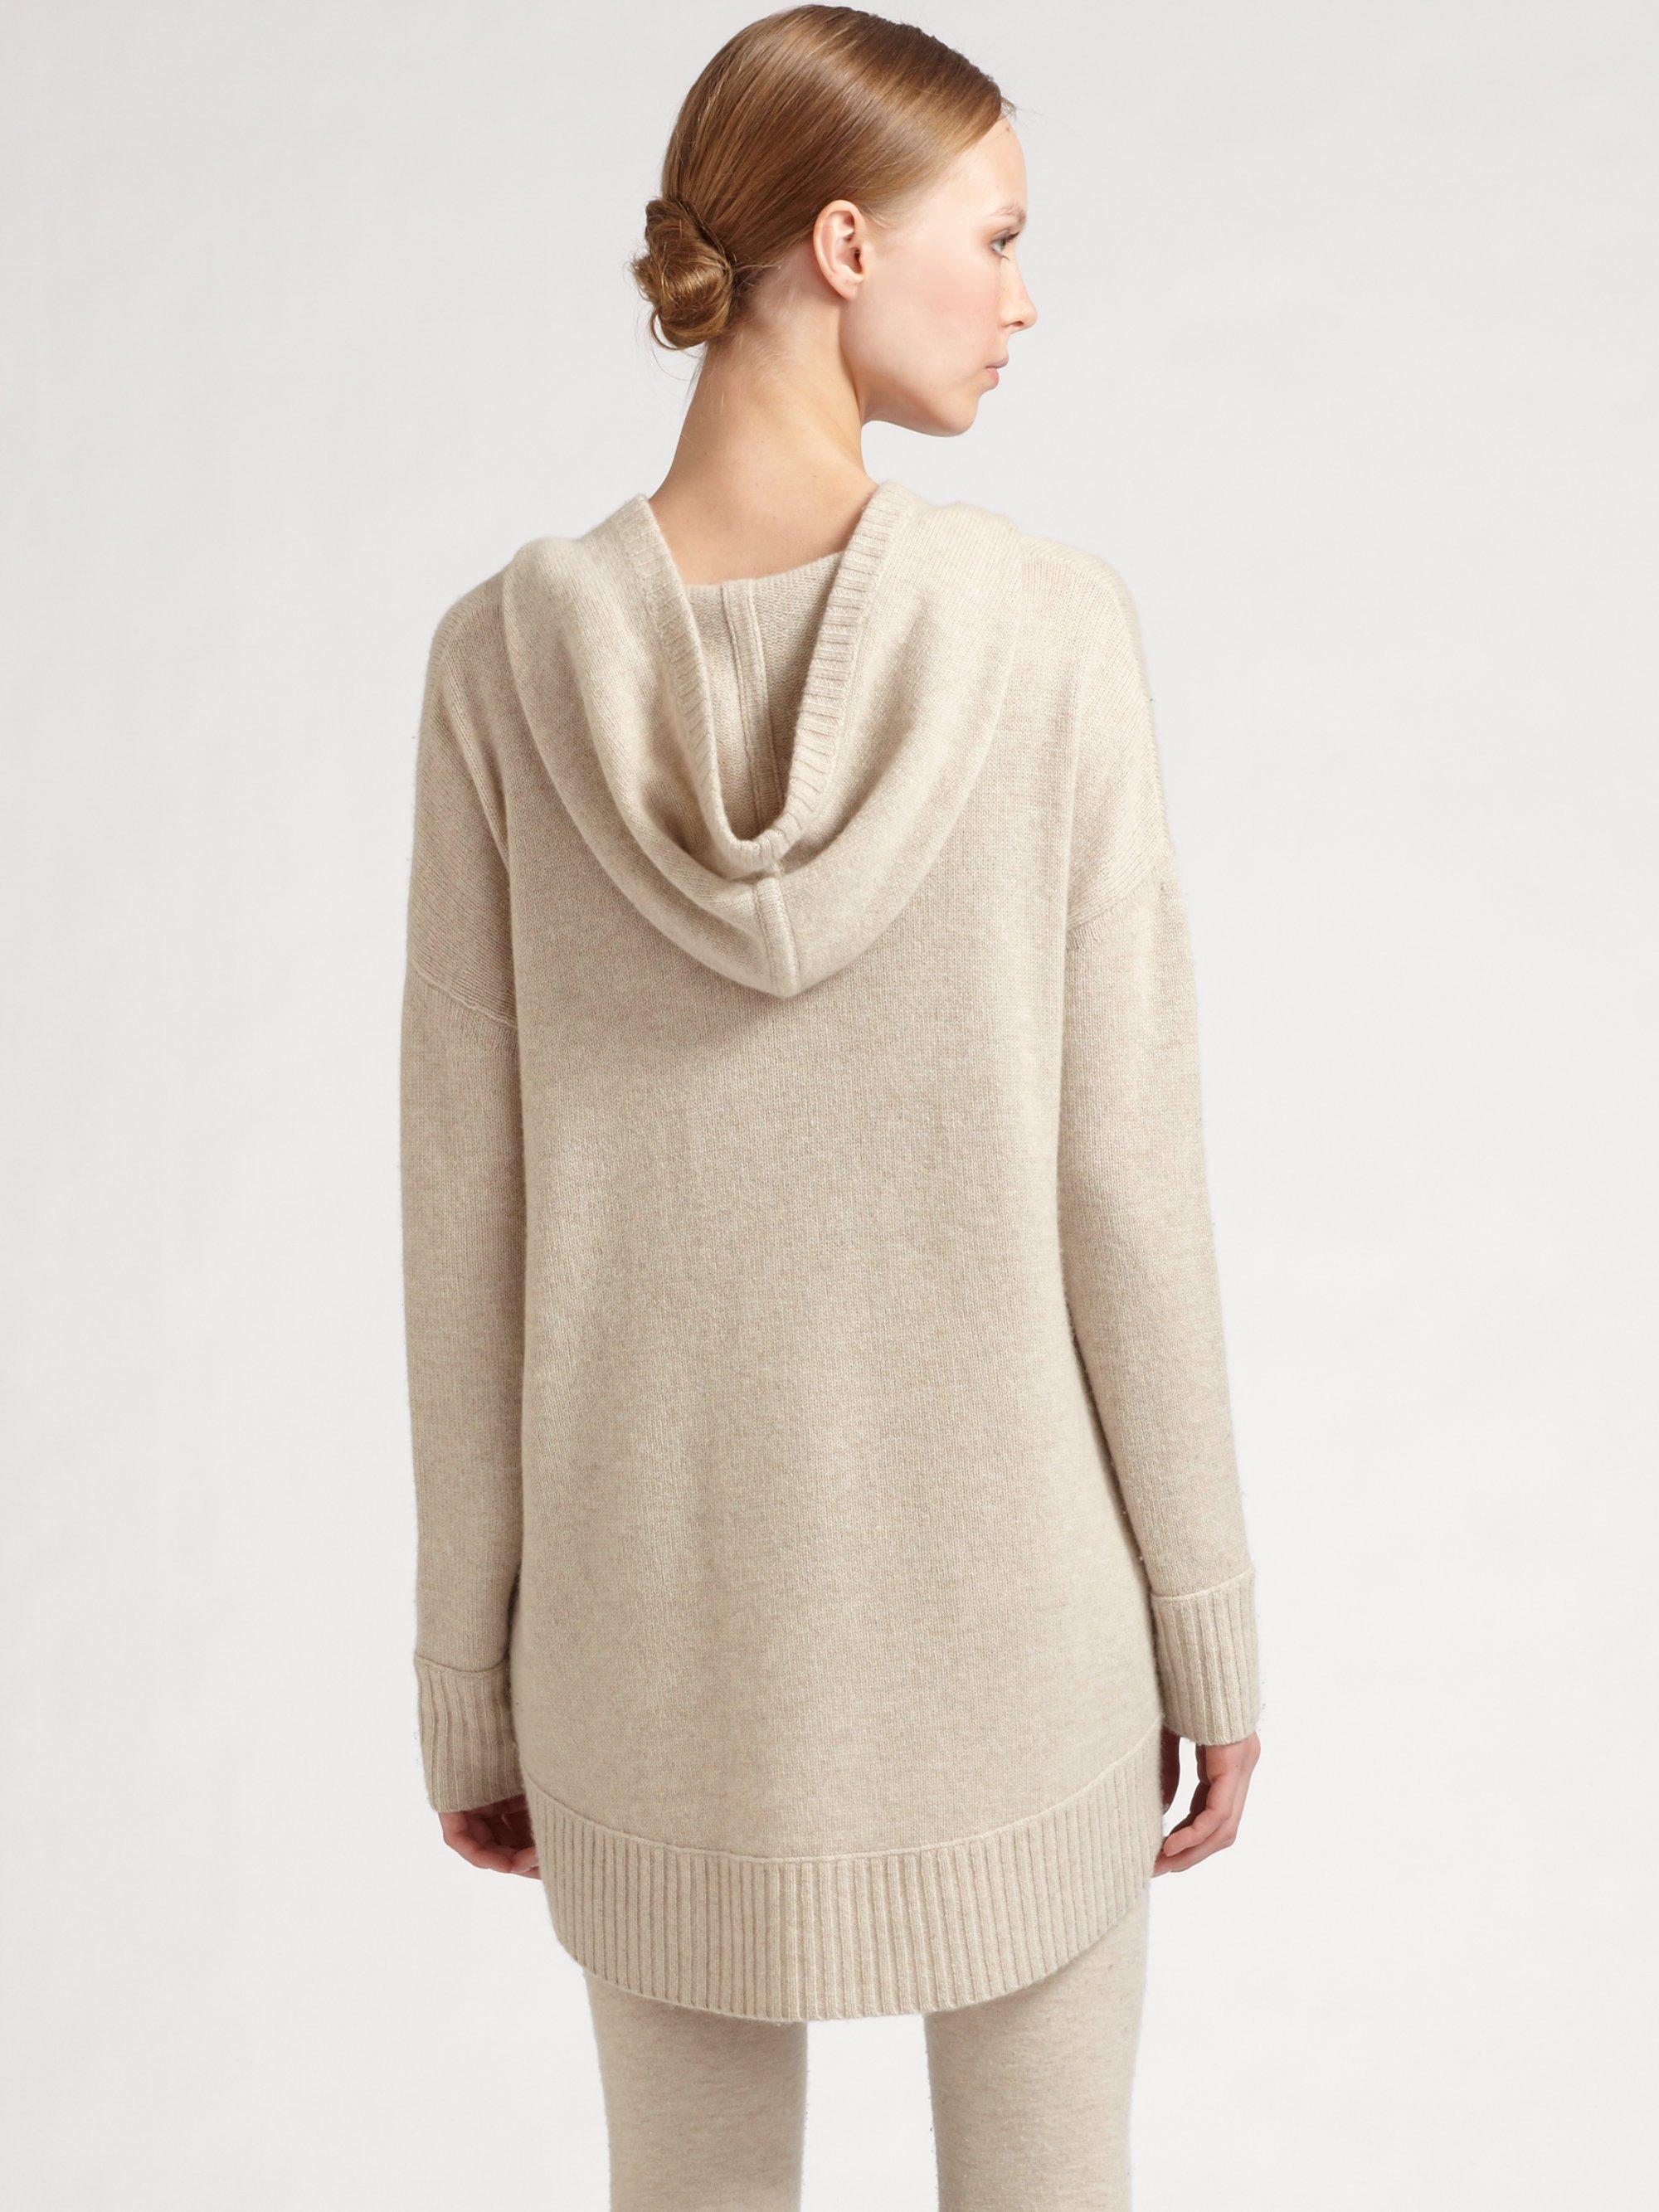 donna karan cashmere hooded sweater in natural lyst. Black Bedroom Furniture Sets. Home Design Ideas